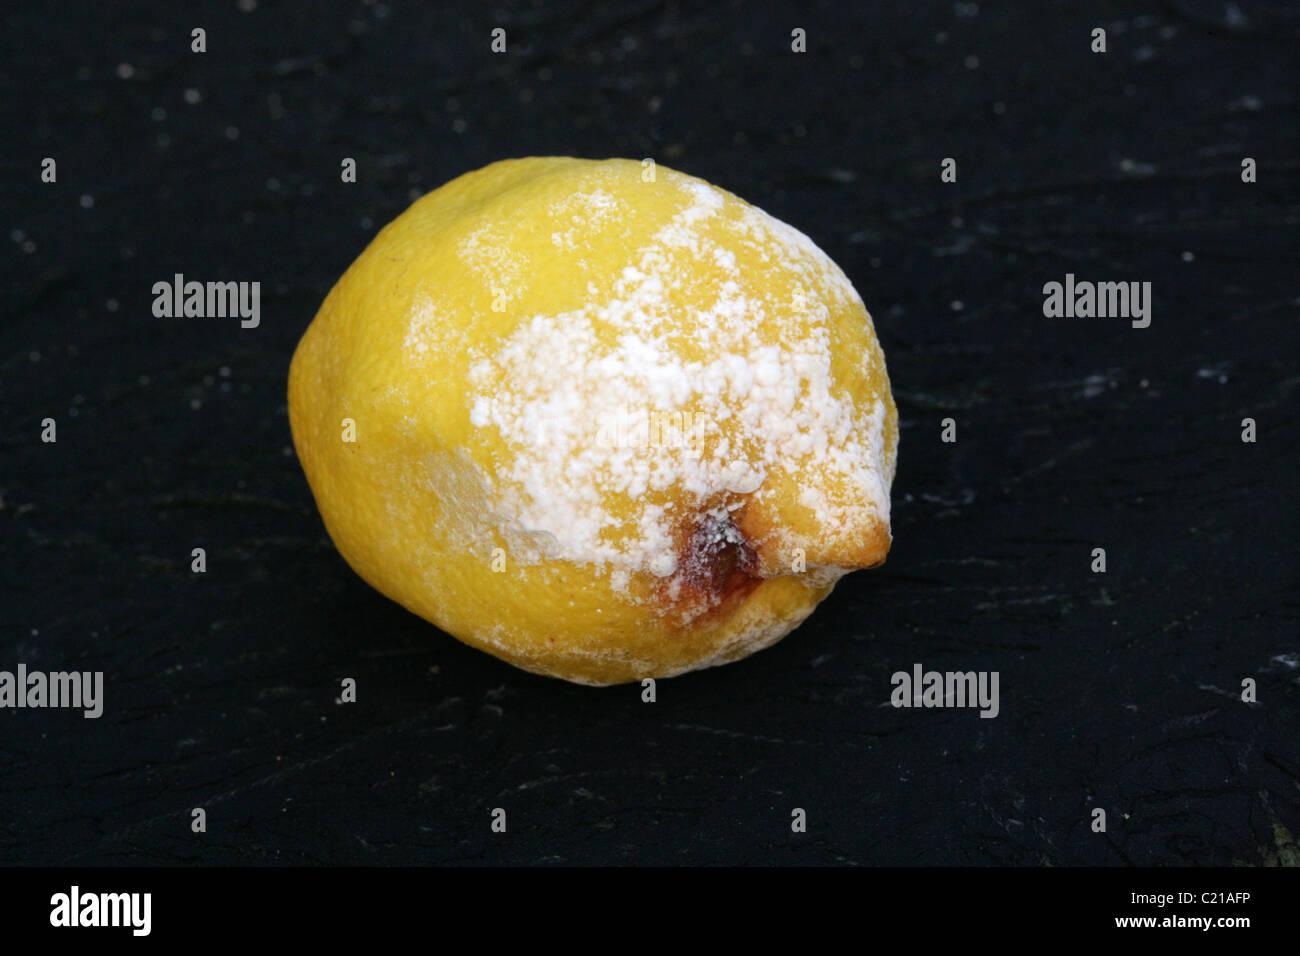 Mold on fruit